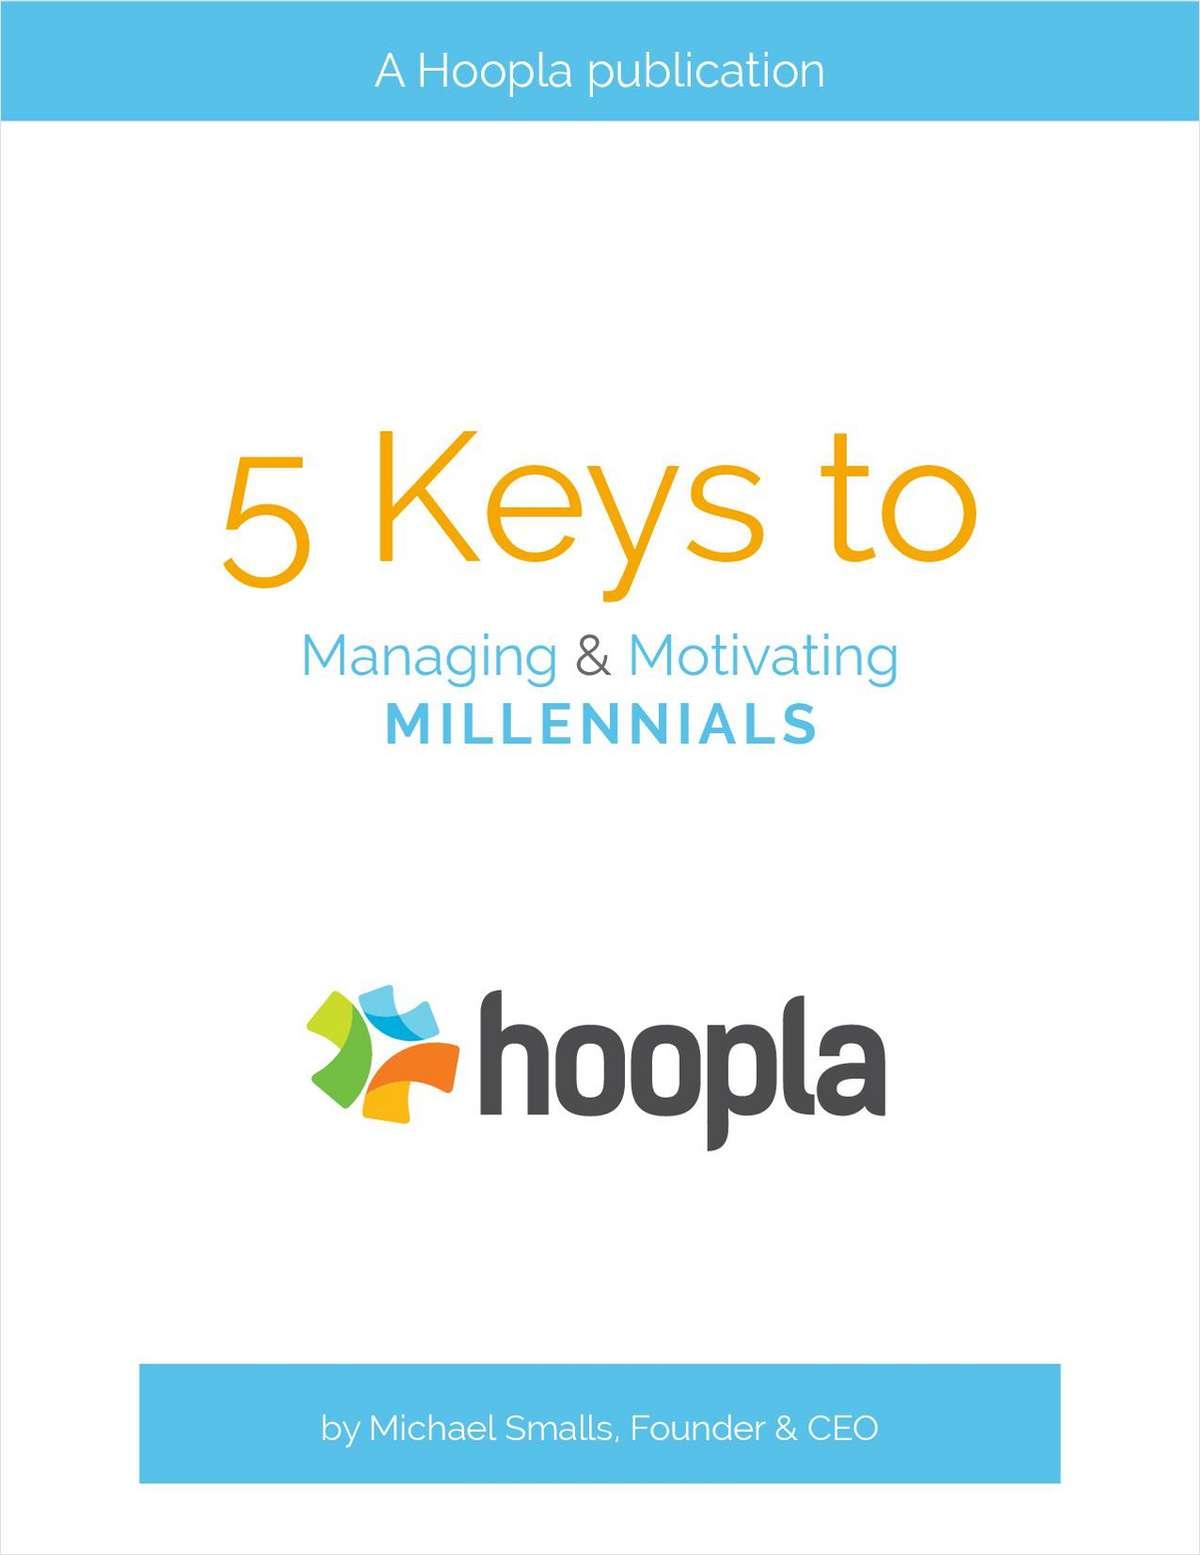 5 Keys to Managing and Motivating Millennials